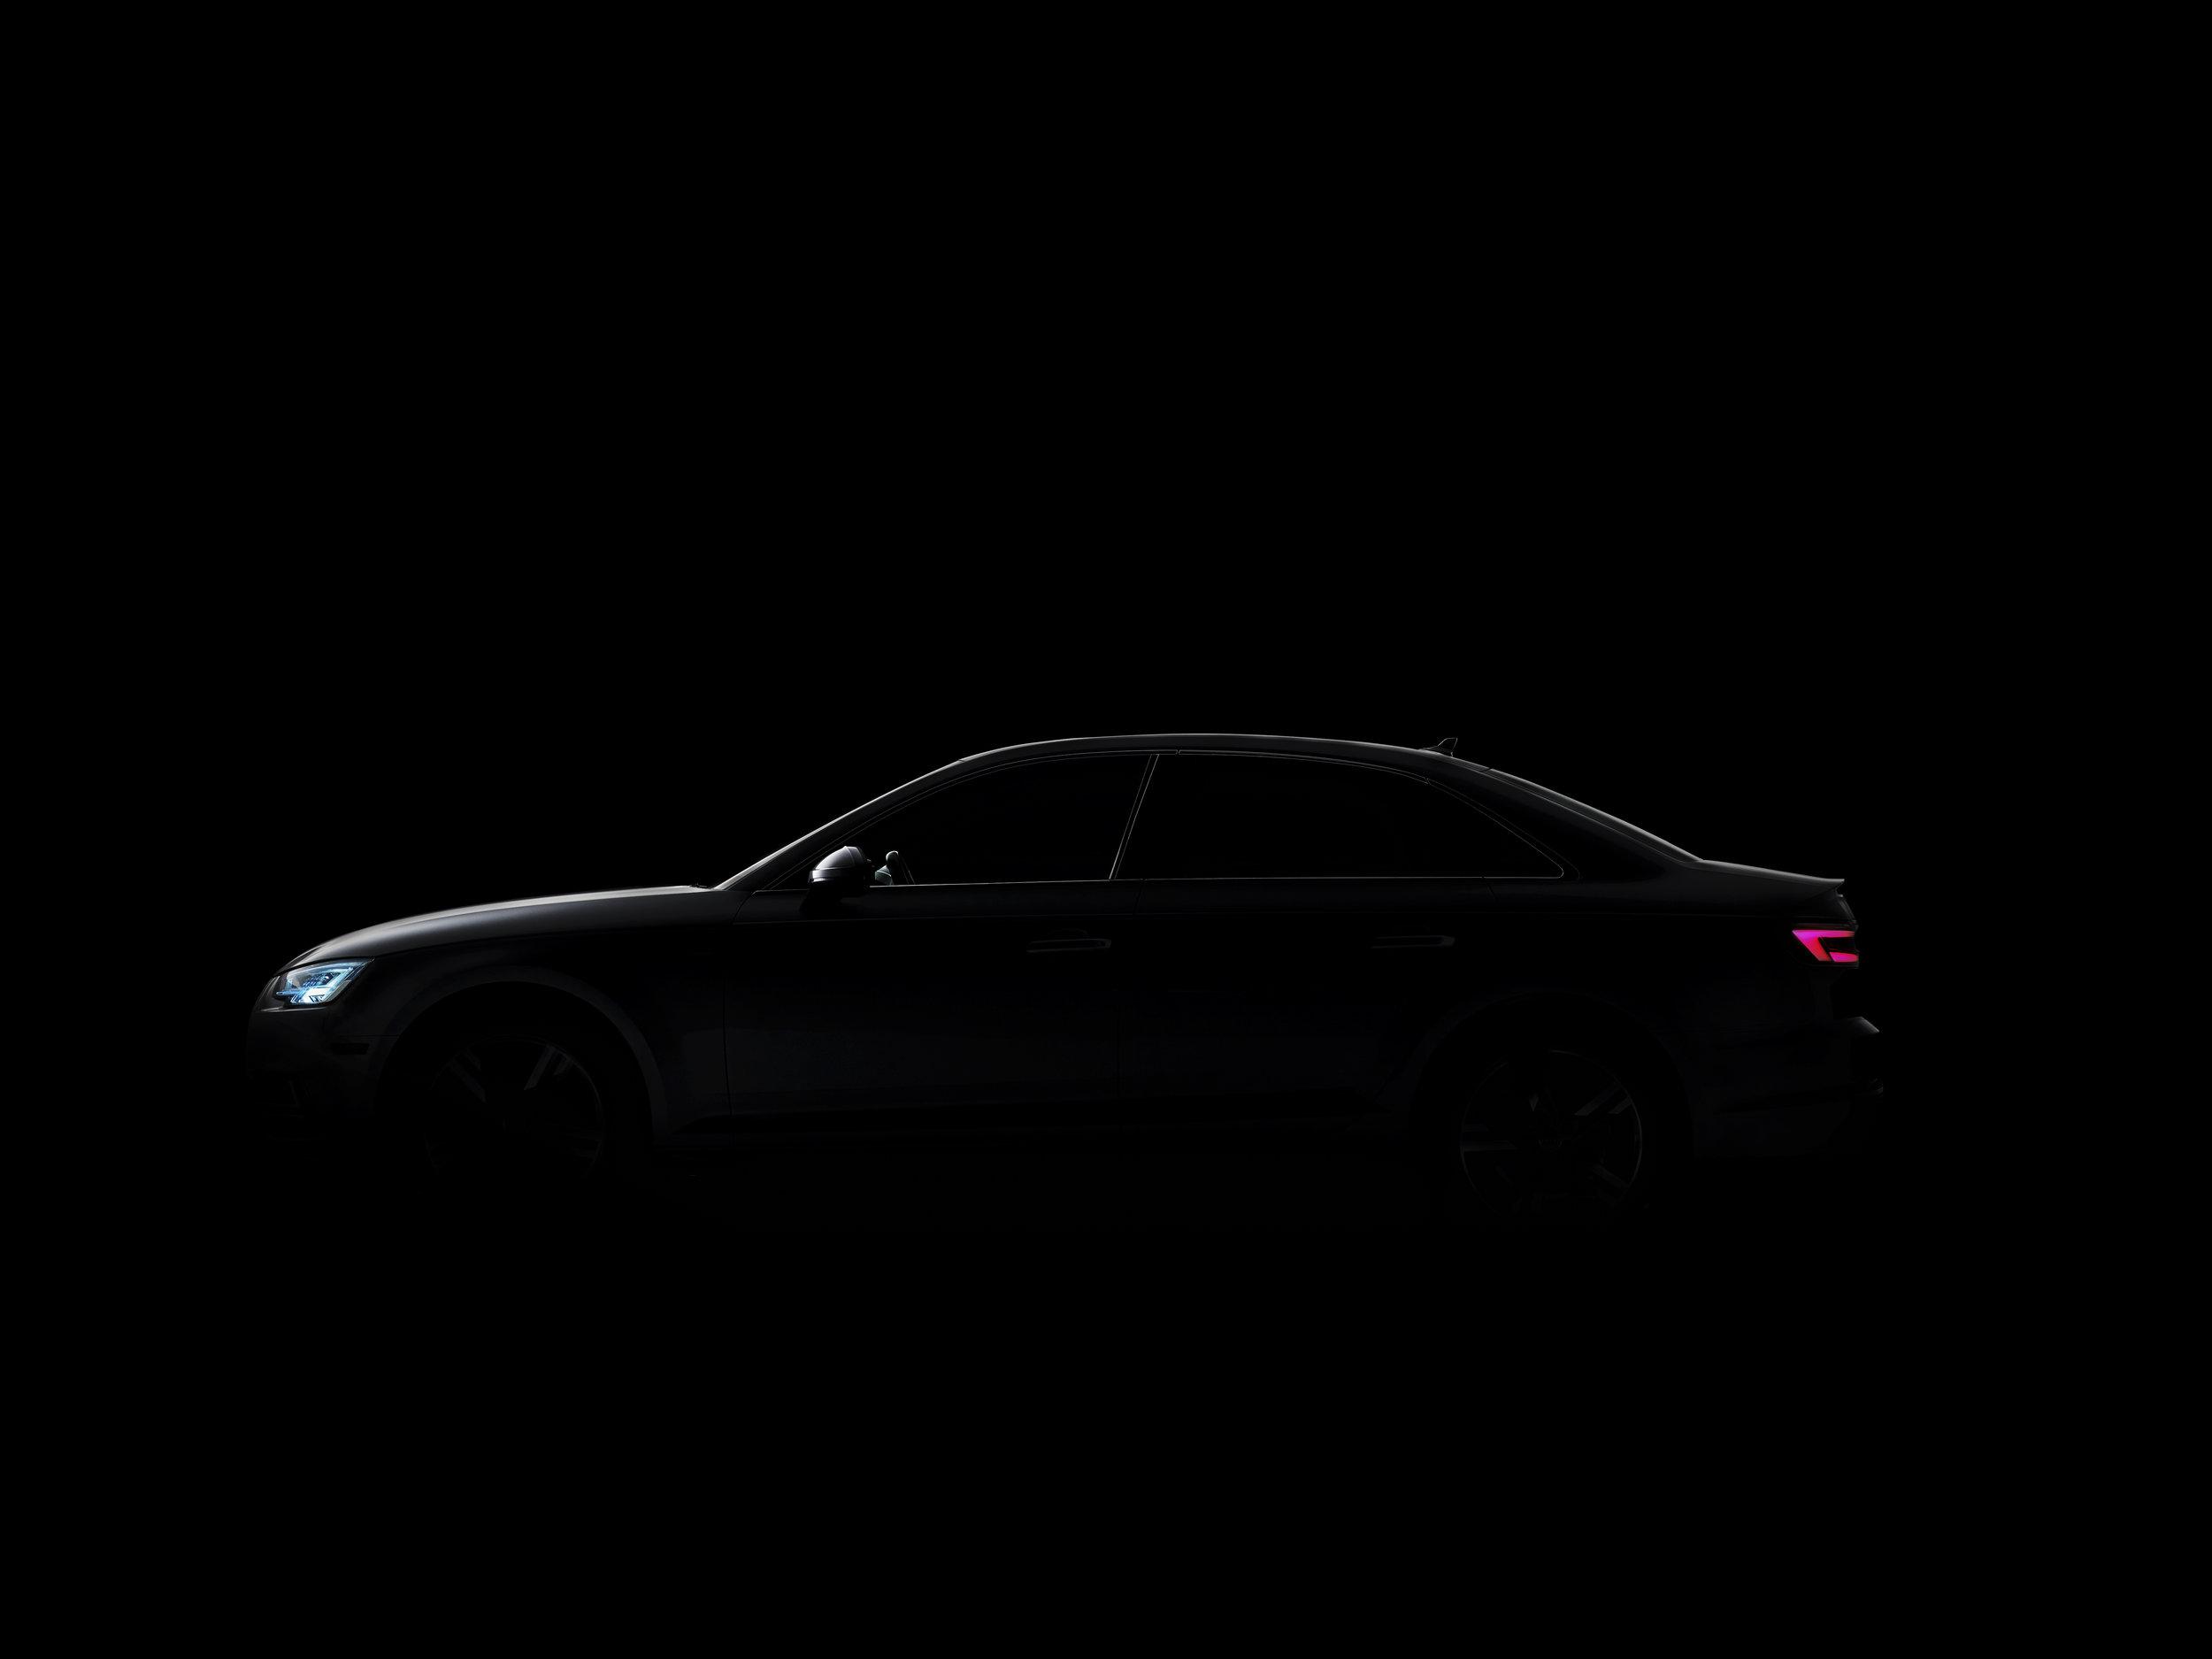 Audi_A4_In_The_Spotlight_01.jpg